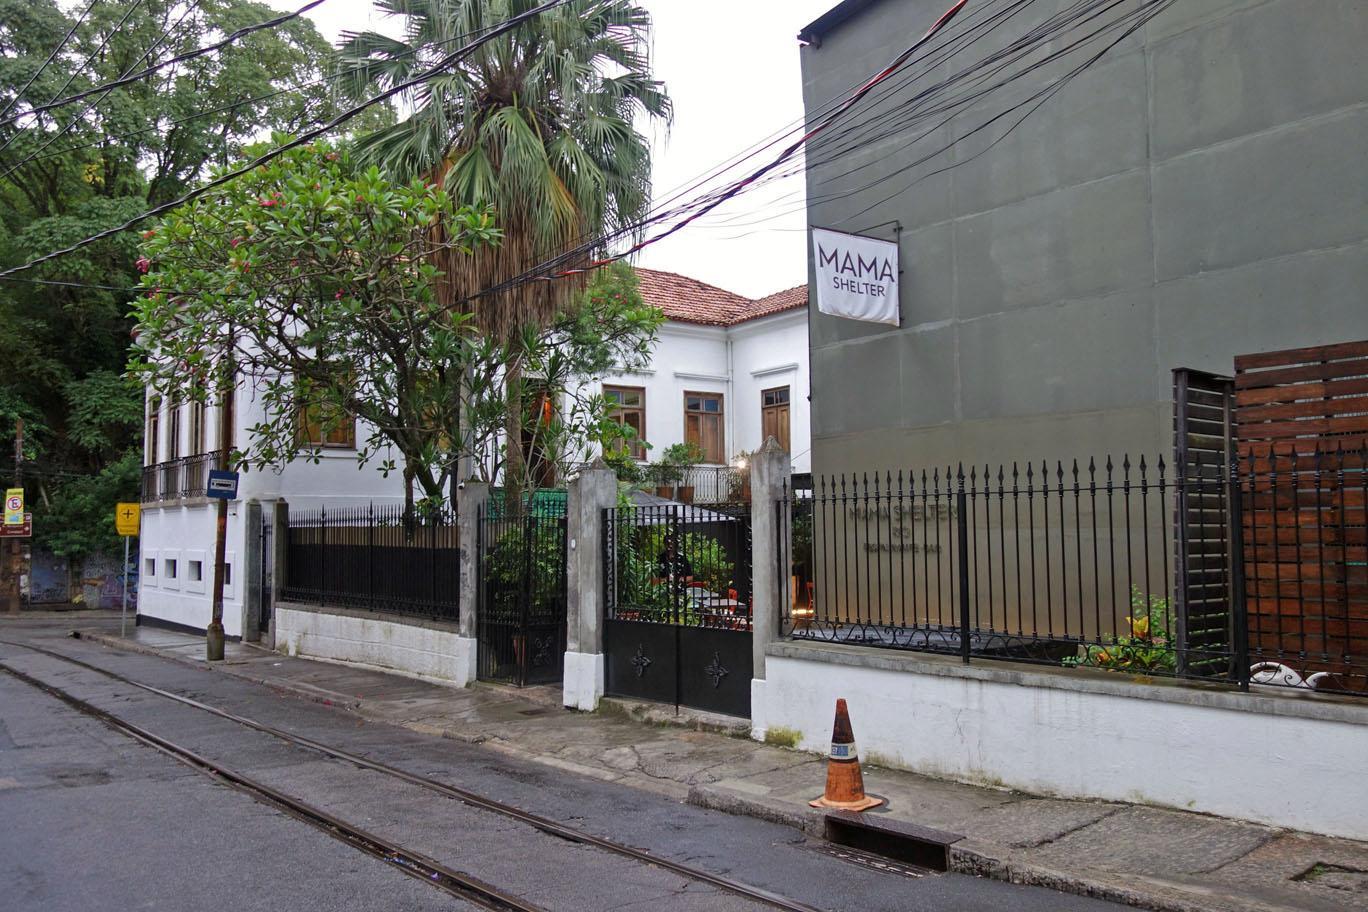 Обзор: Mama Shelter, Рио-де-Жанейро